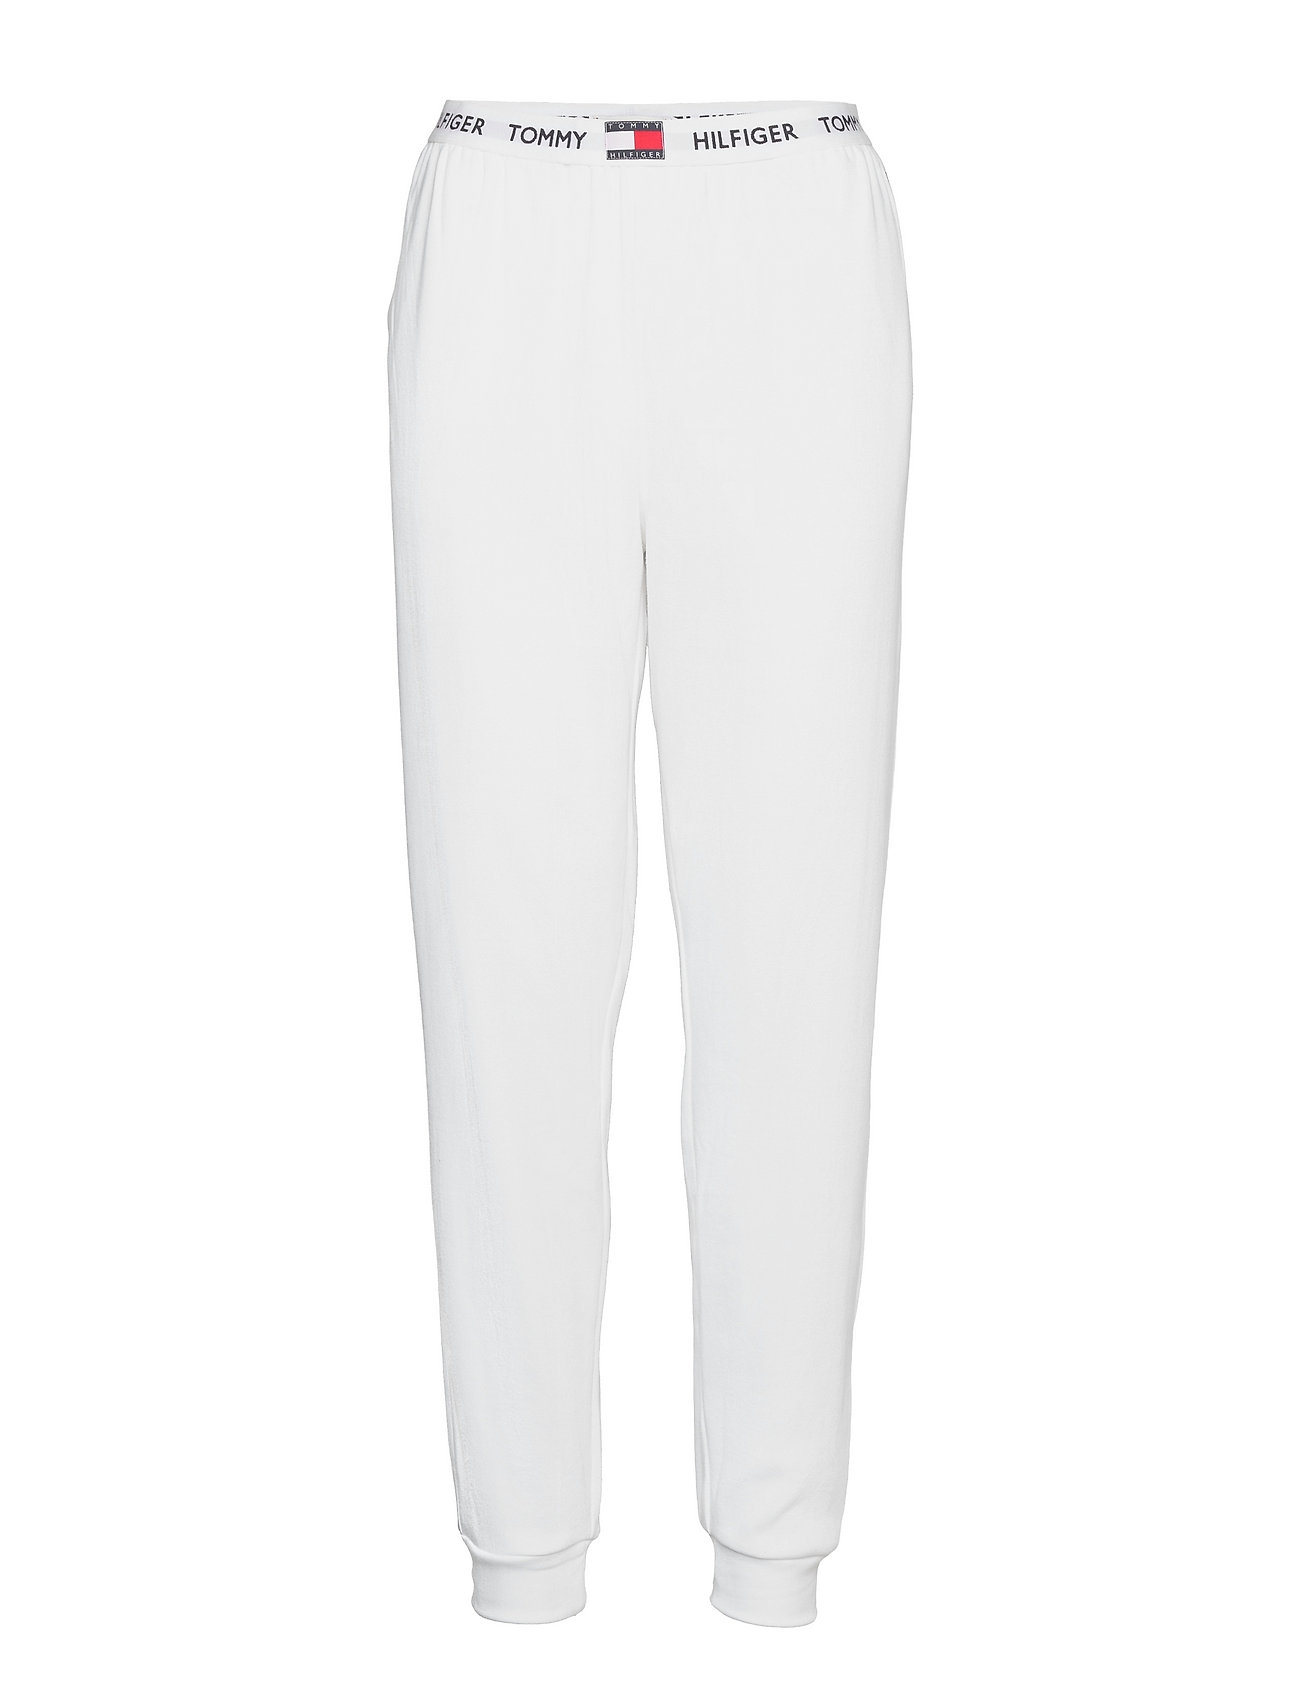 Pant Lwk Pyjamasbukser Hyggebukser Hvid Tommy Hilfiger